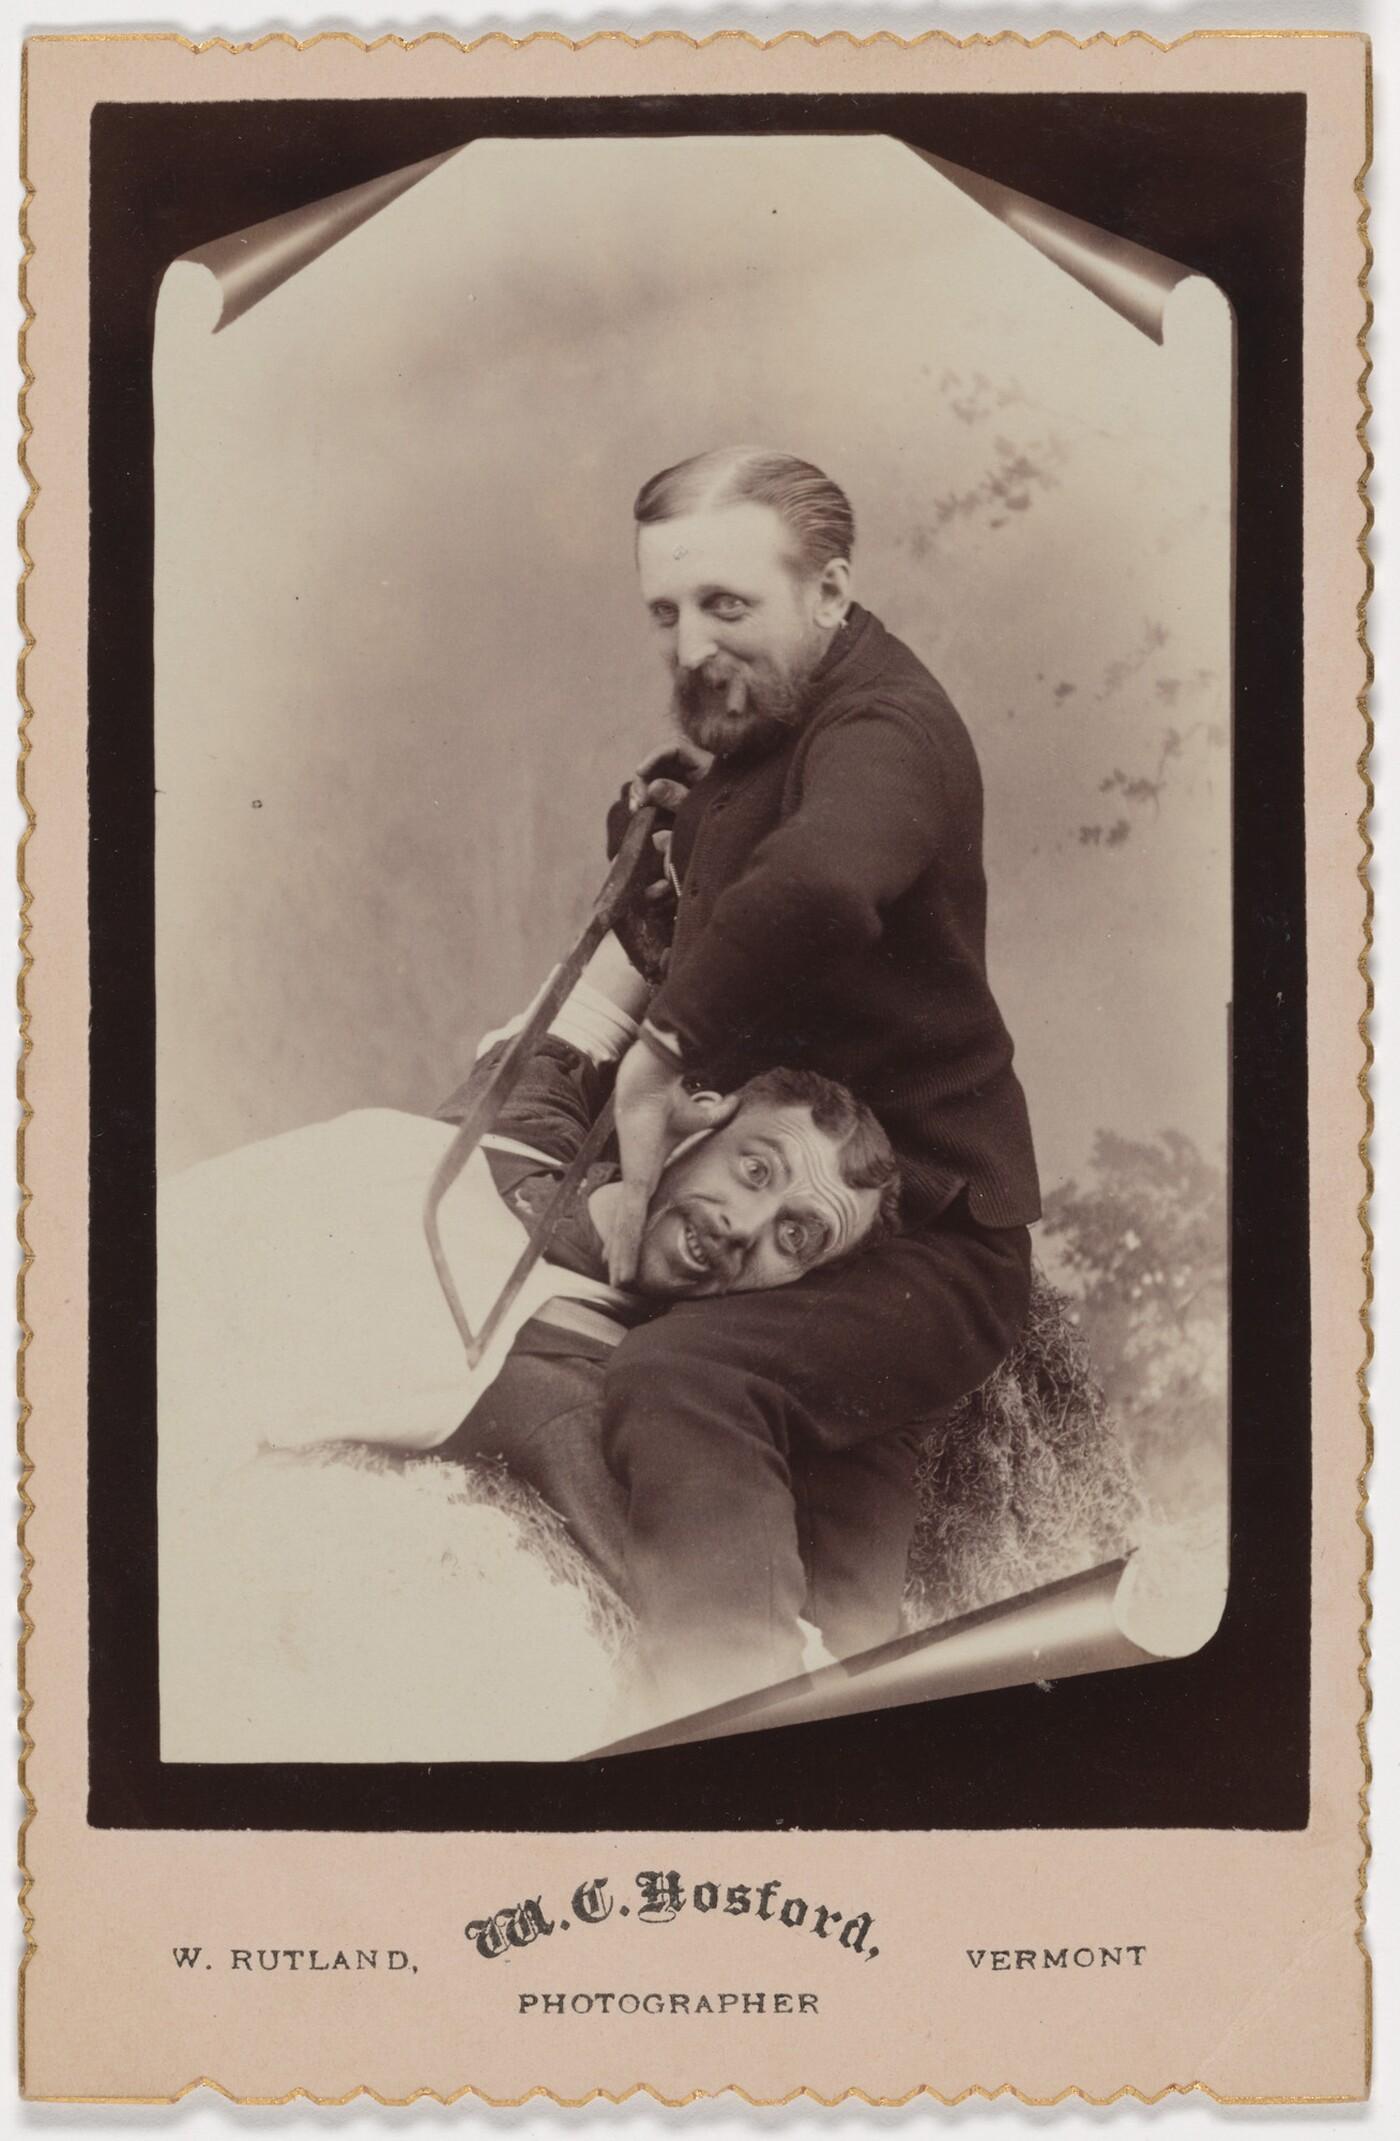 M.C. Hosford, West Rutland, CT, [Getting the saw], 1880s, albumen silver print